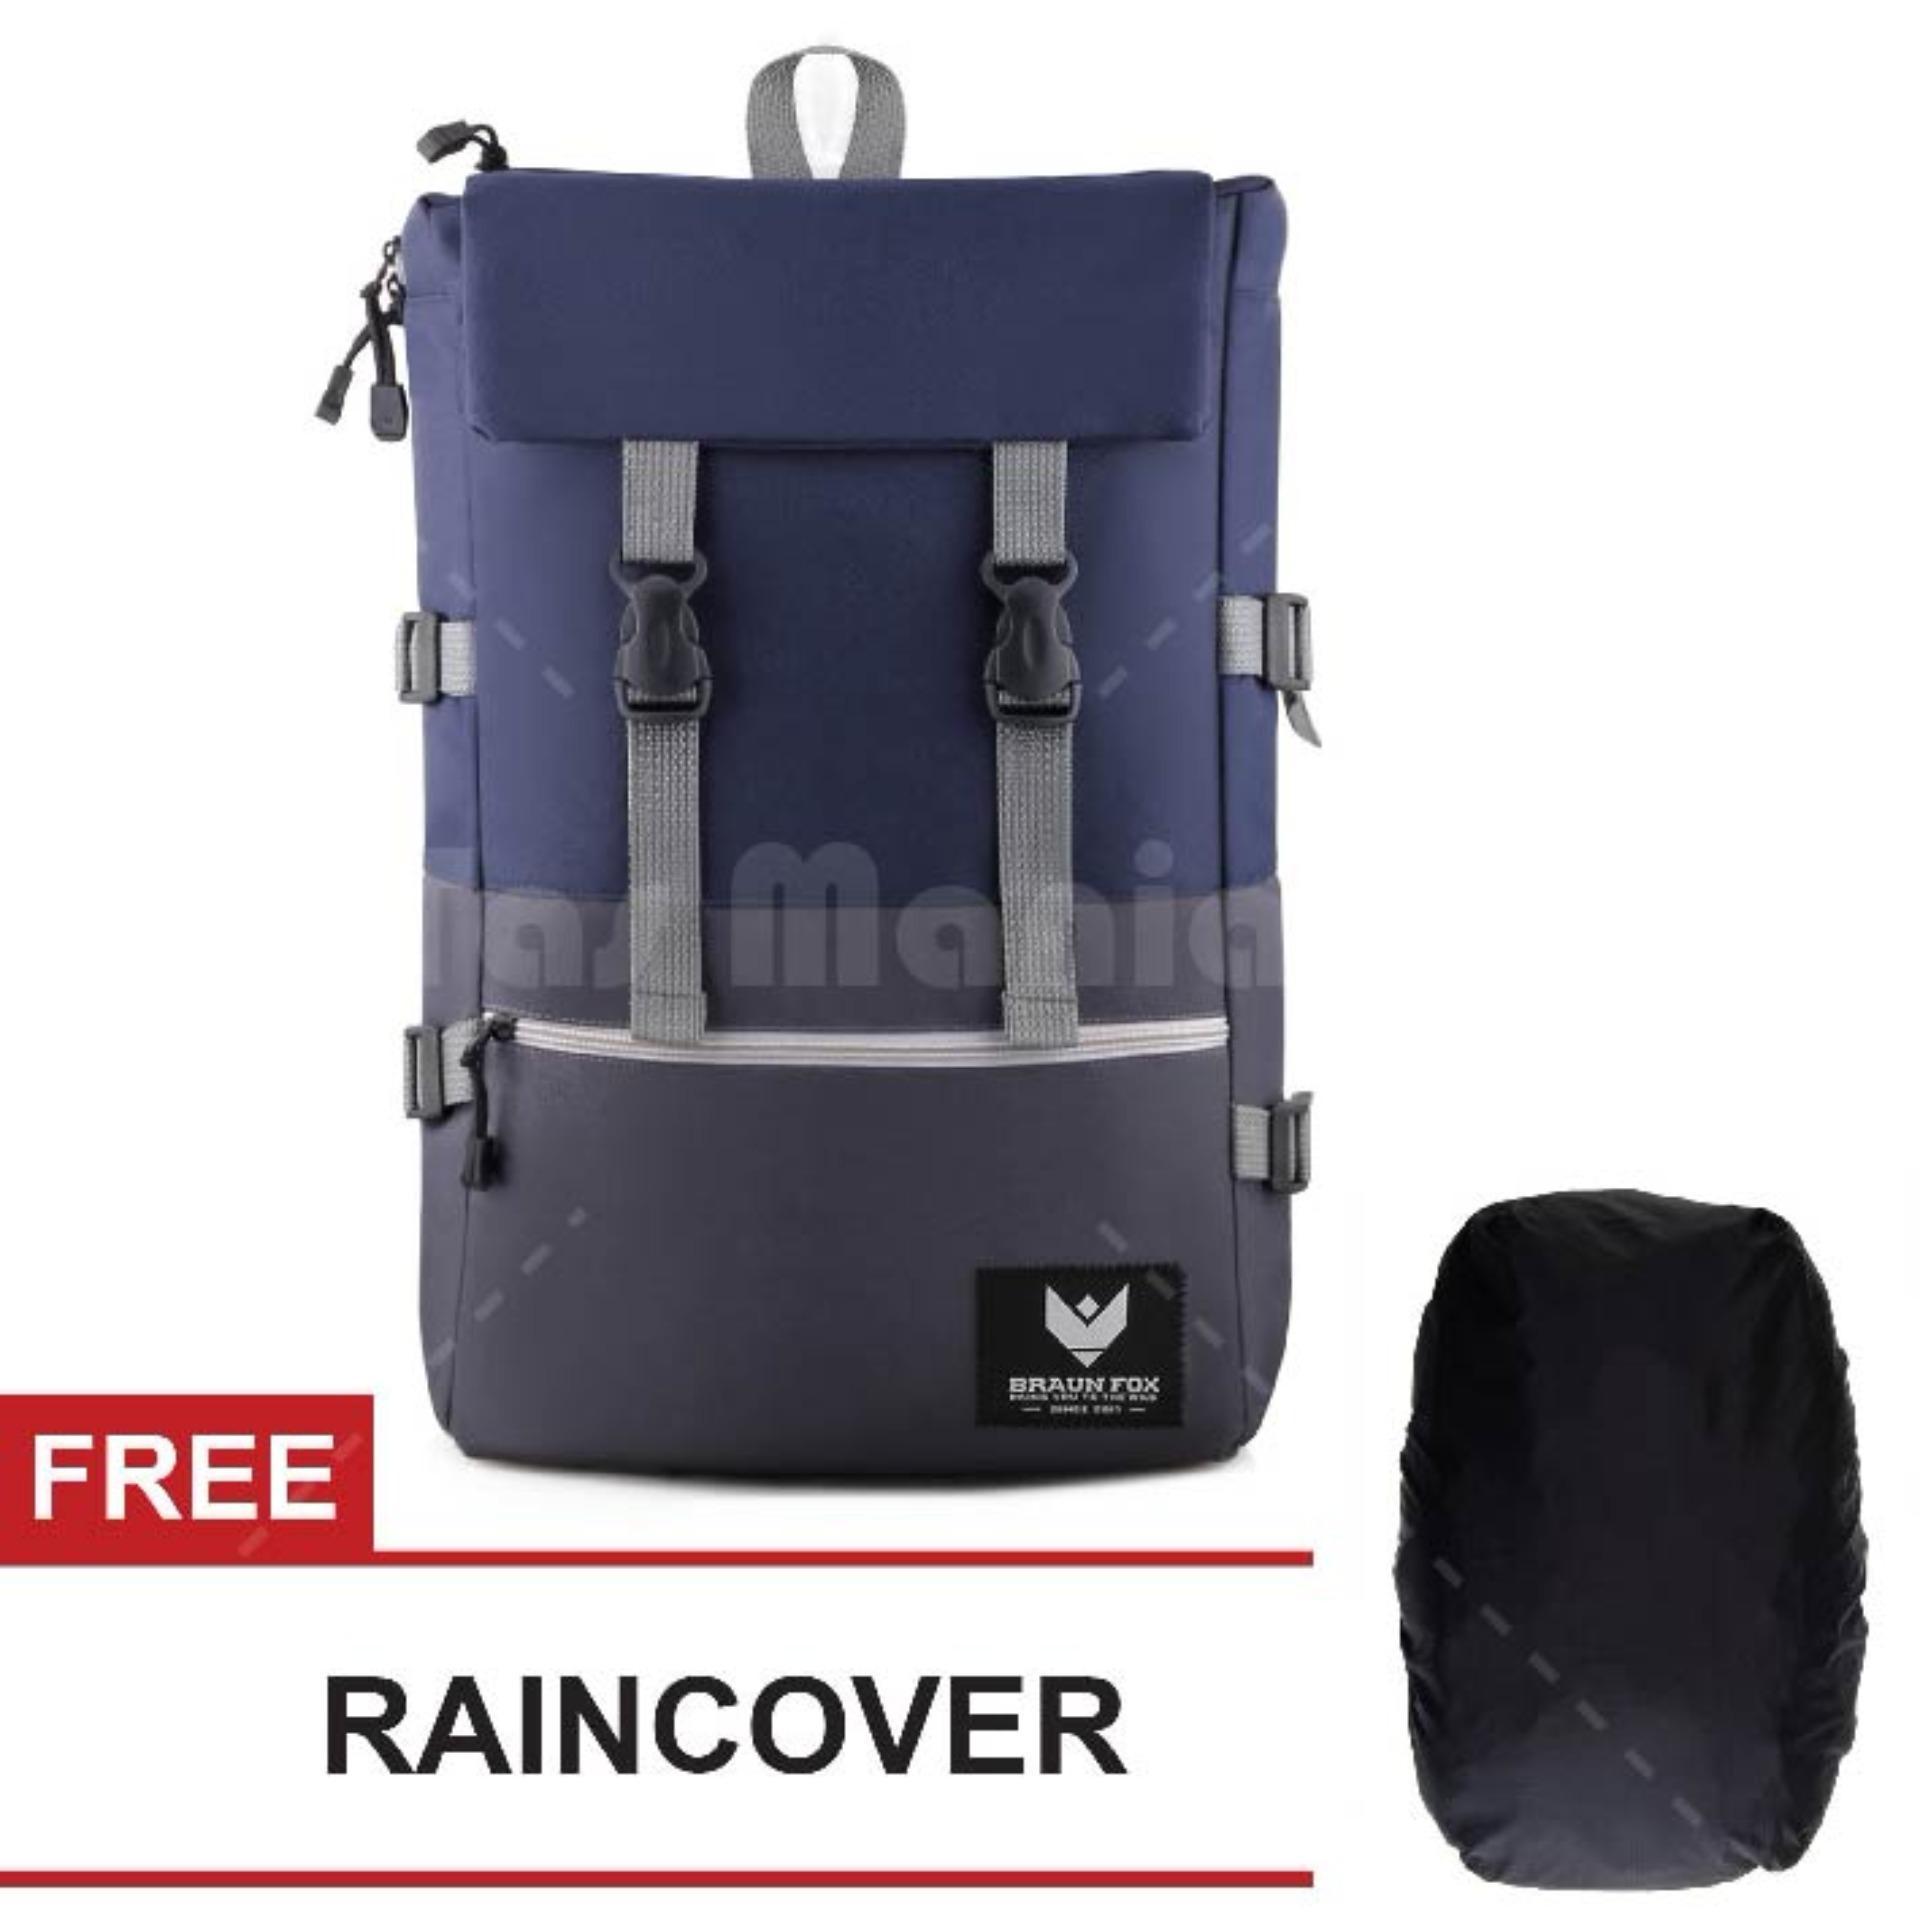 Beli Tas Ransel Braun Fox Ace 01 Dailypack Outdoor Tas Laptop Backpack Blue Free Raincover Tas Pria Tas Kerja Tas Fashion Pria Lengkap